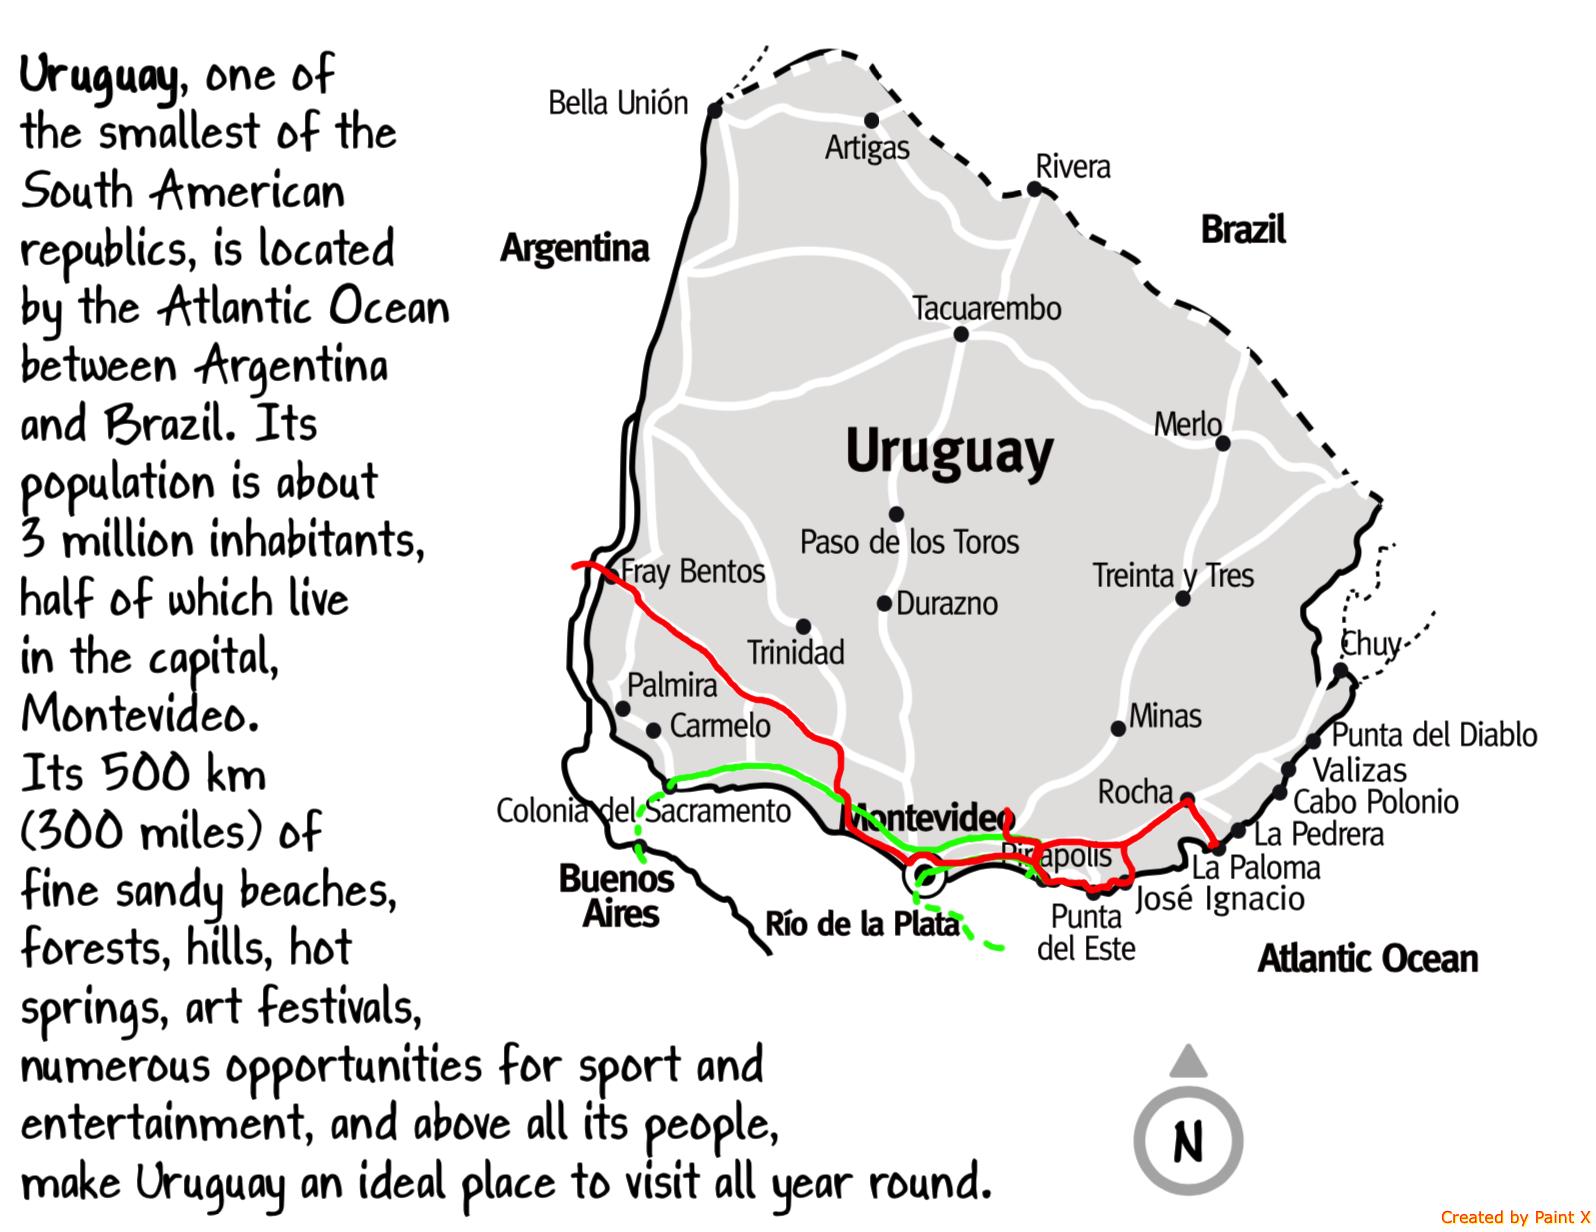 001 Uruguaypng